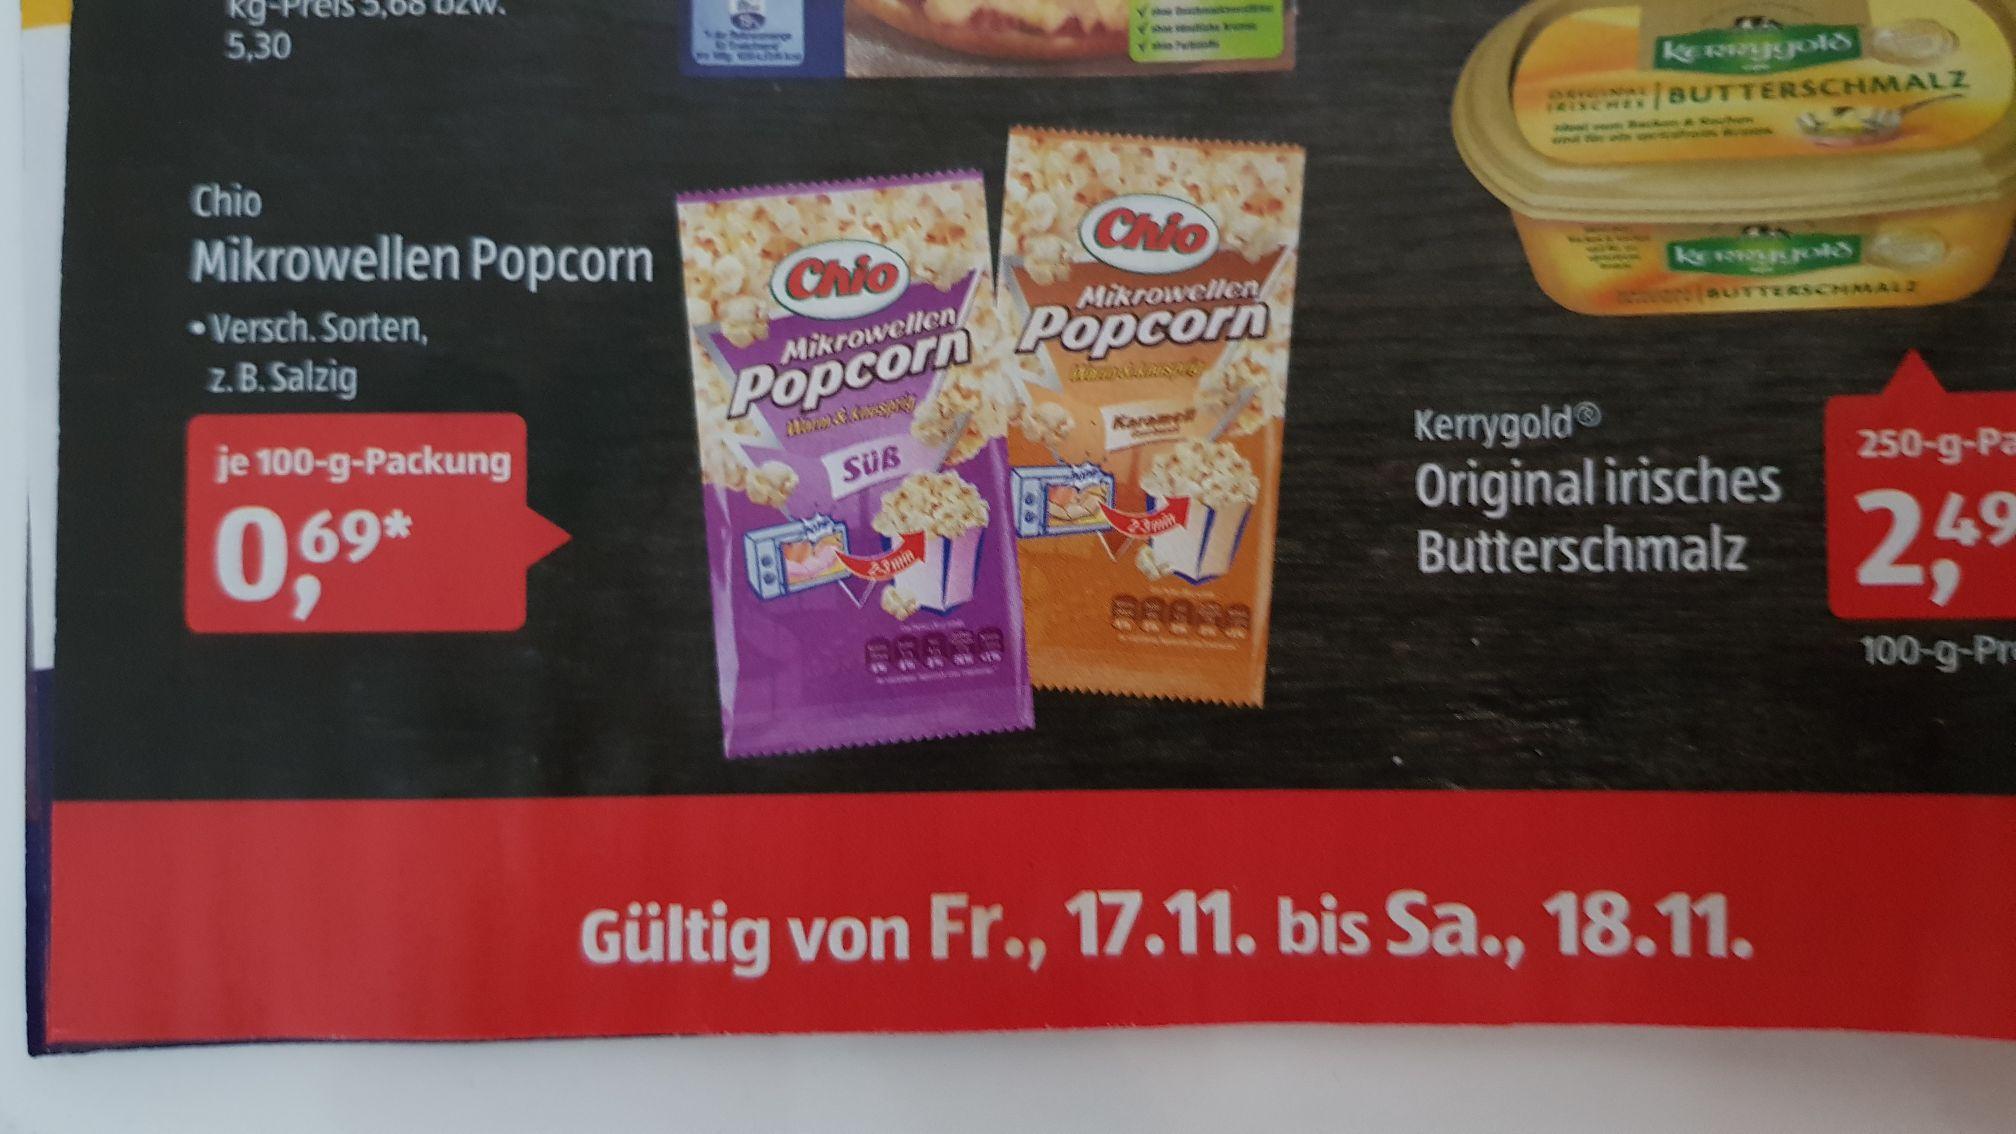 Chio Mikrowellen Popcorn 0,69€